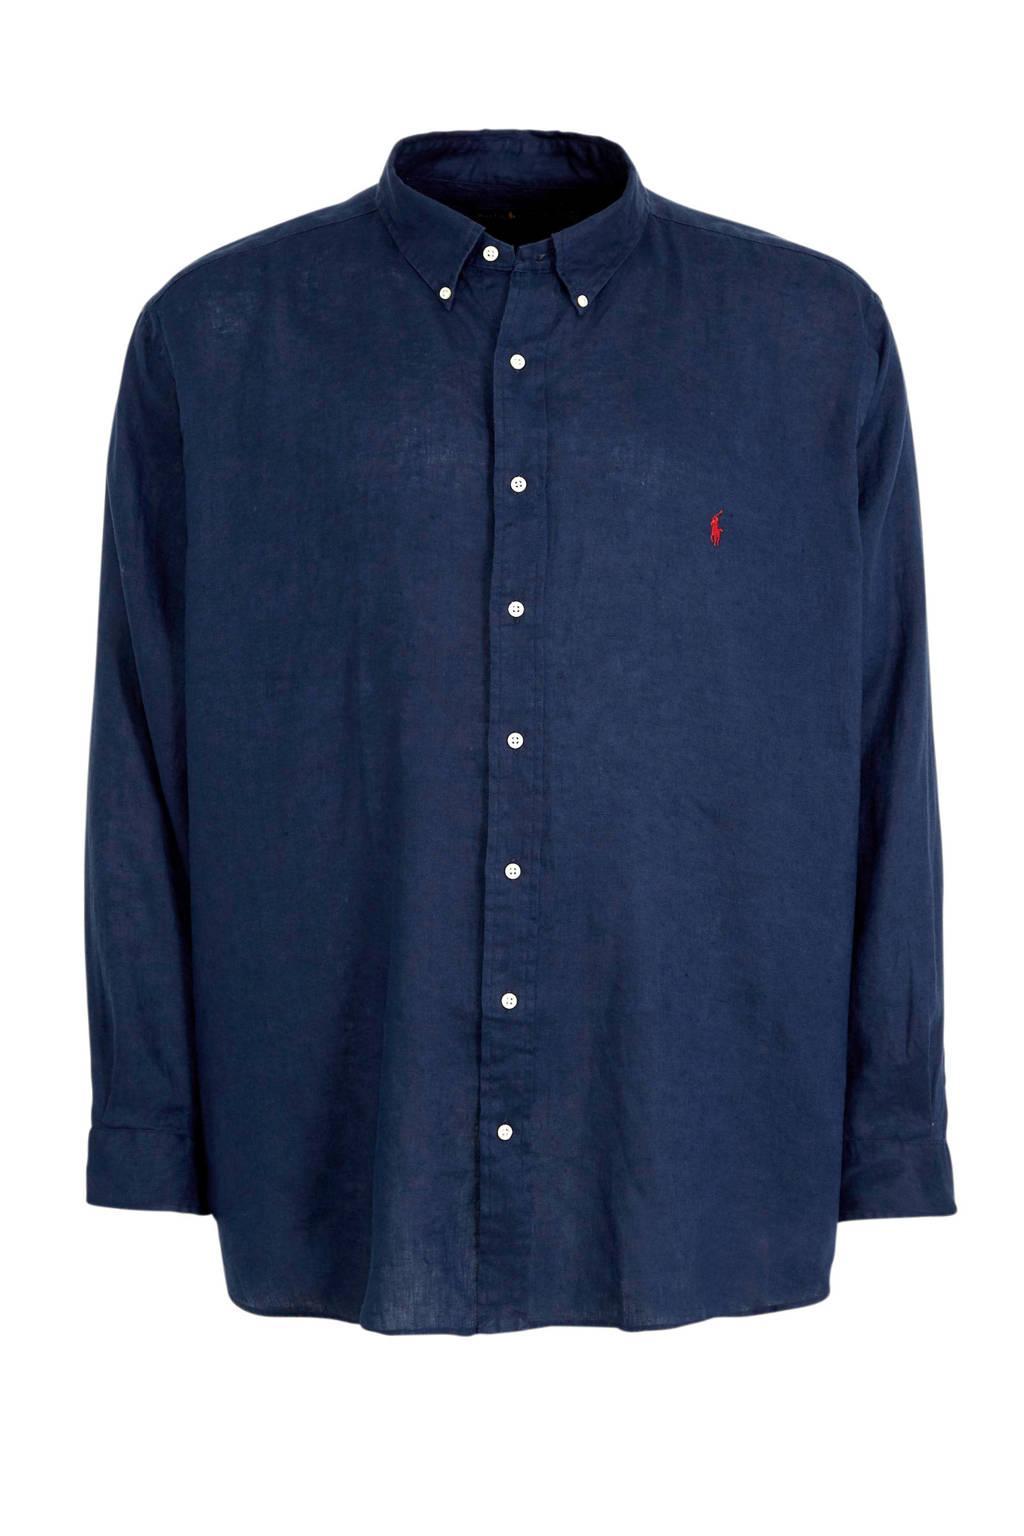 POLO Ralph Lauren Big & Tall +size linnen regular fit overhemd donkerblauw, Donkerblauw